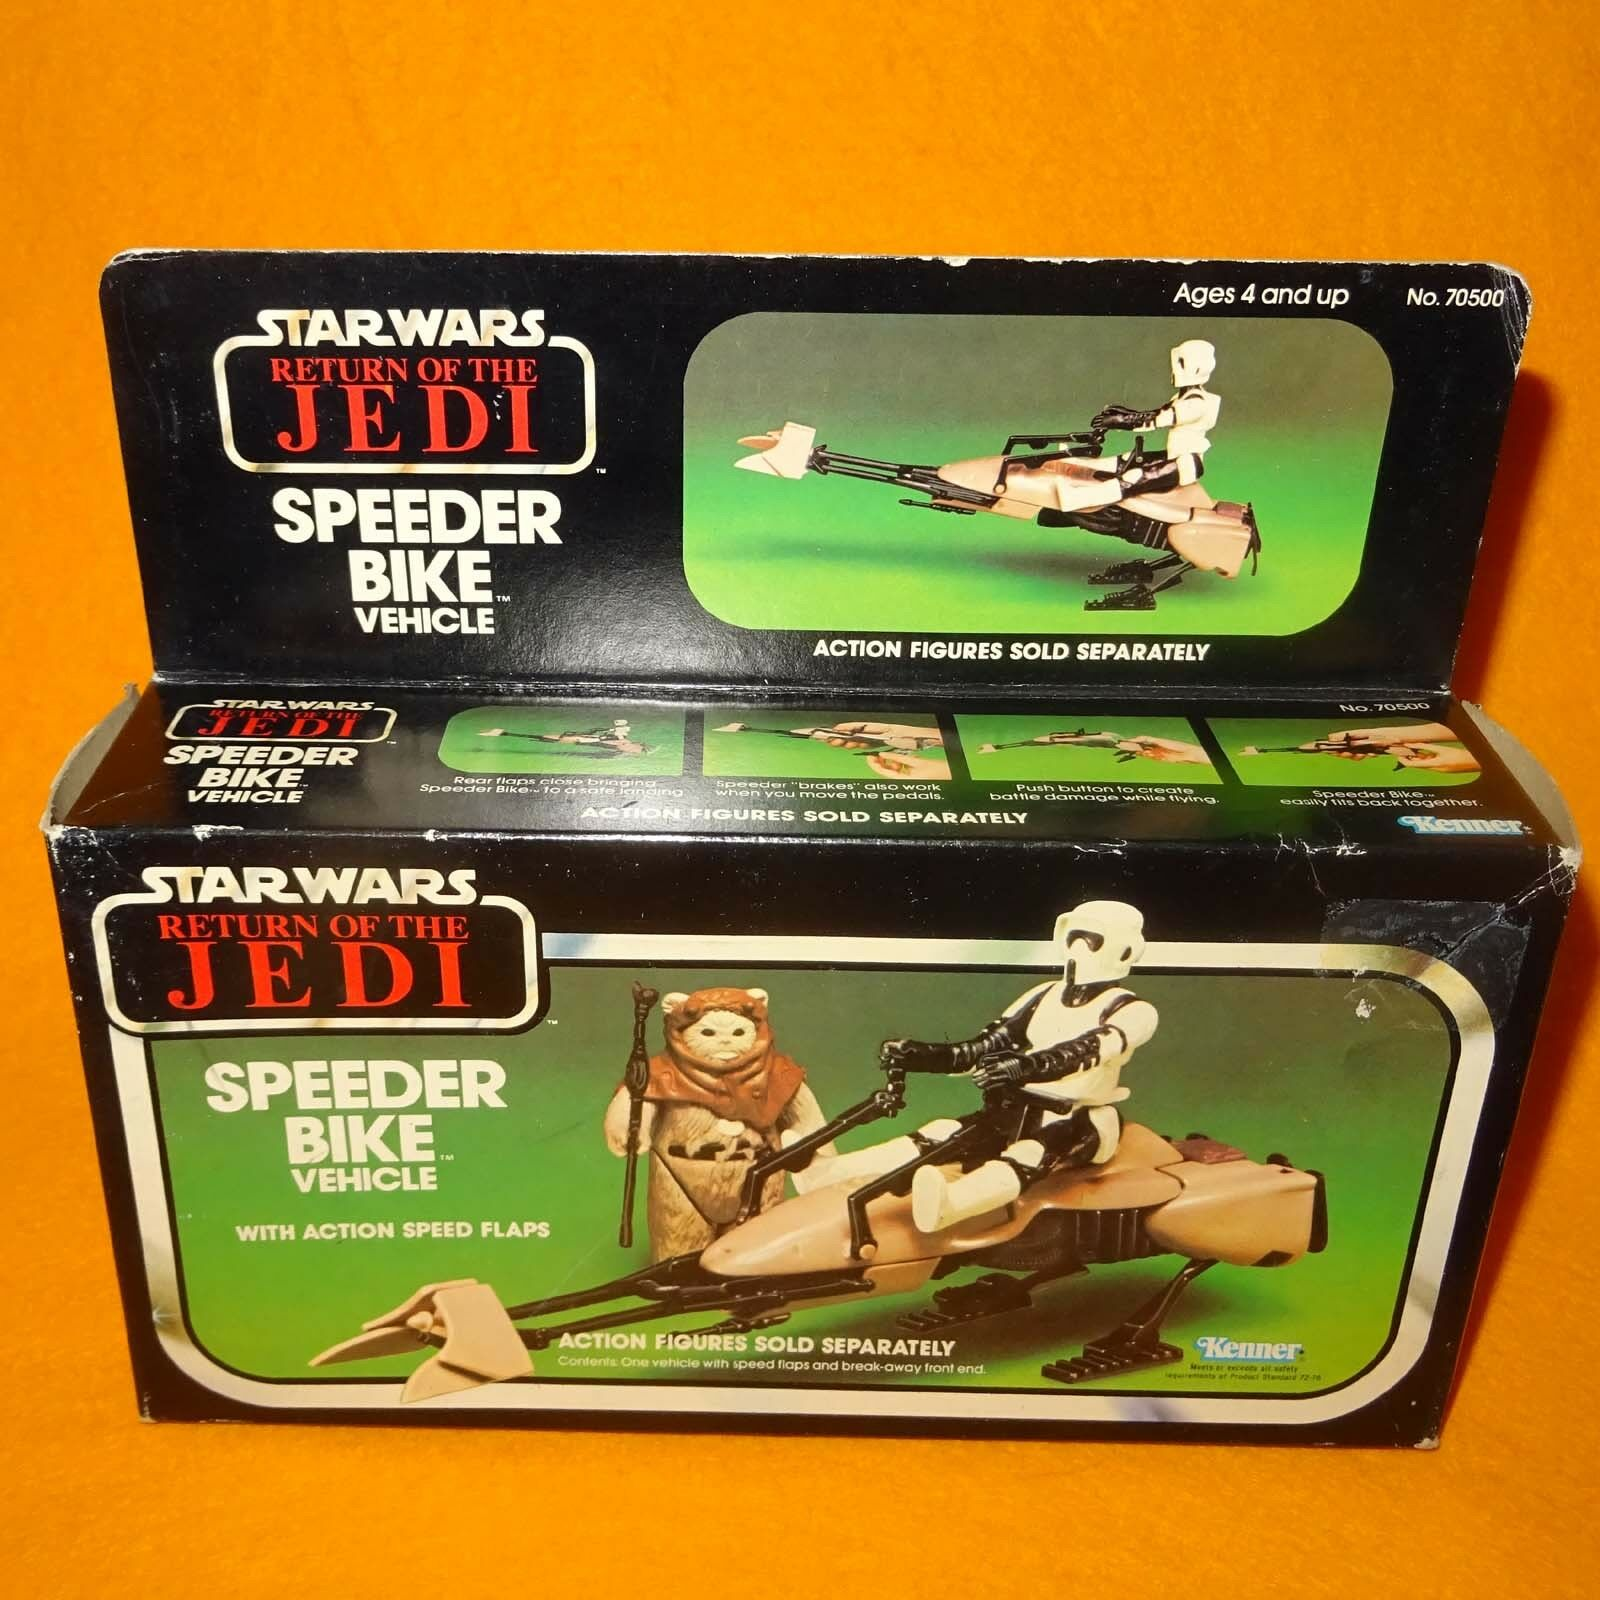 VINTAGE 1983 KENNER STAR WARS RETURN OF THE JEDI SPEEDER BIKE VEHICLE BOXED MISB